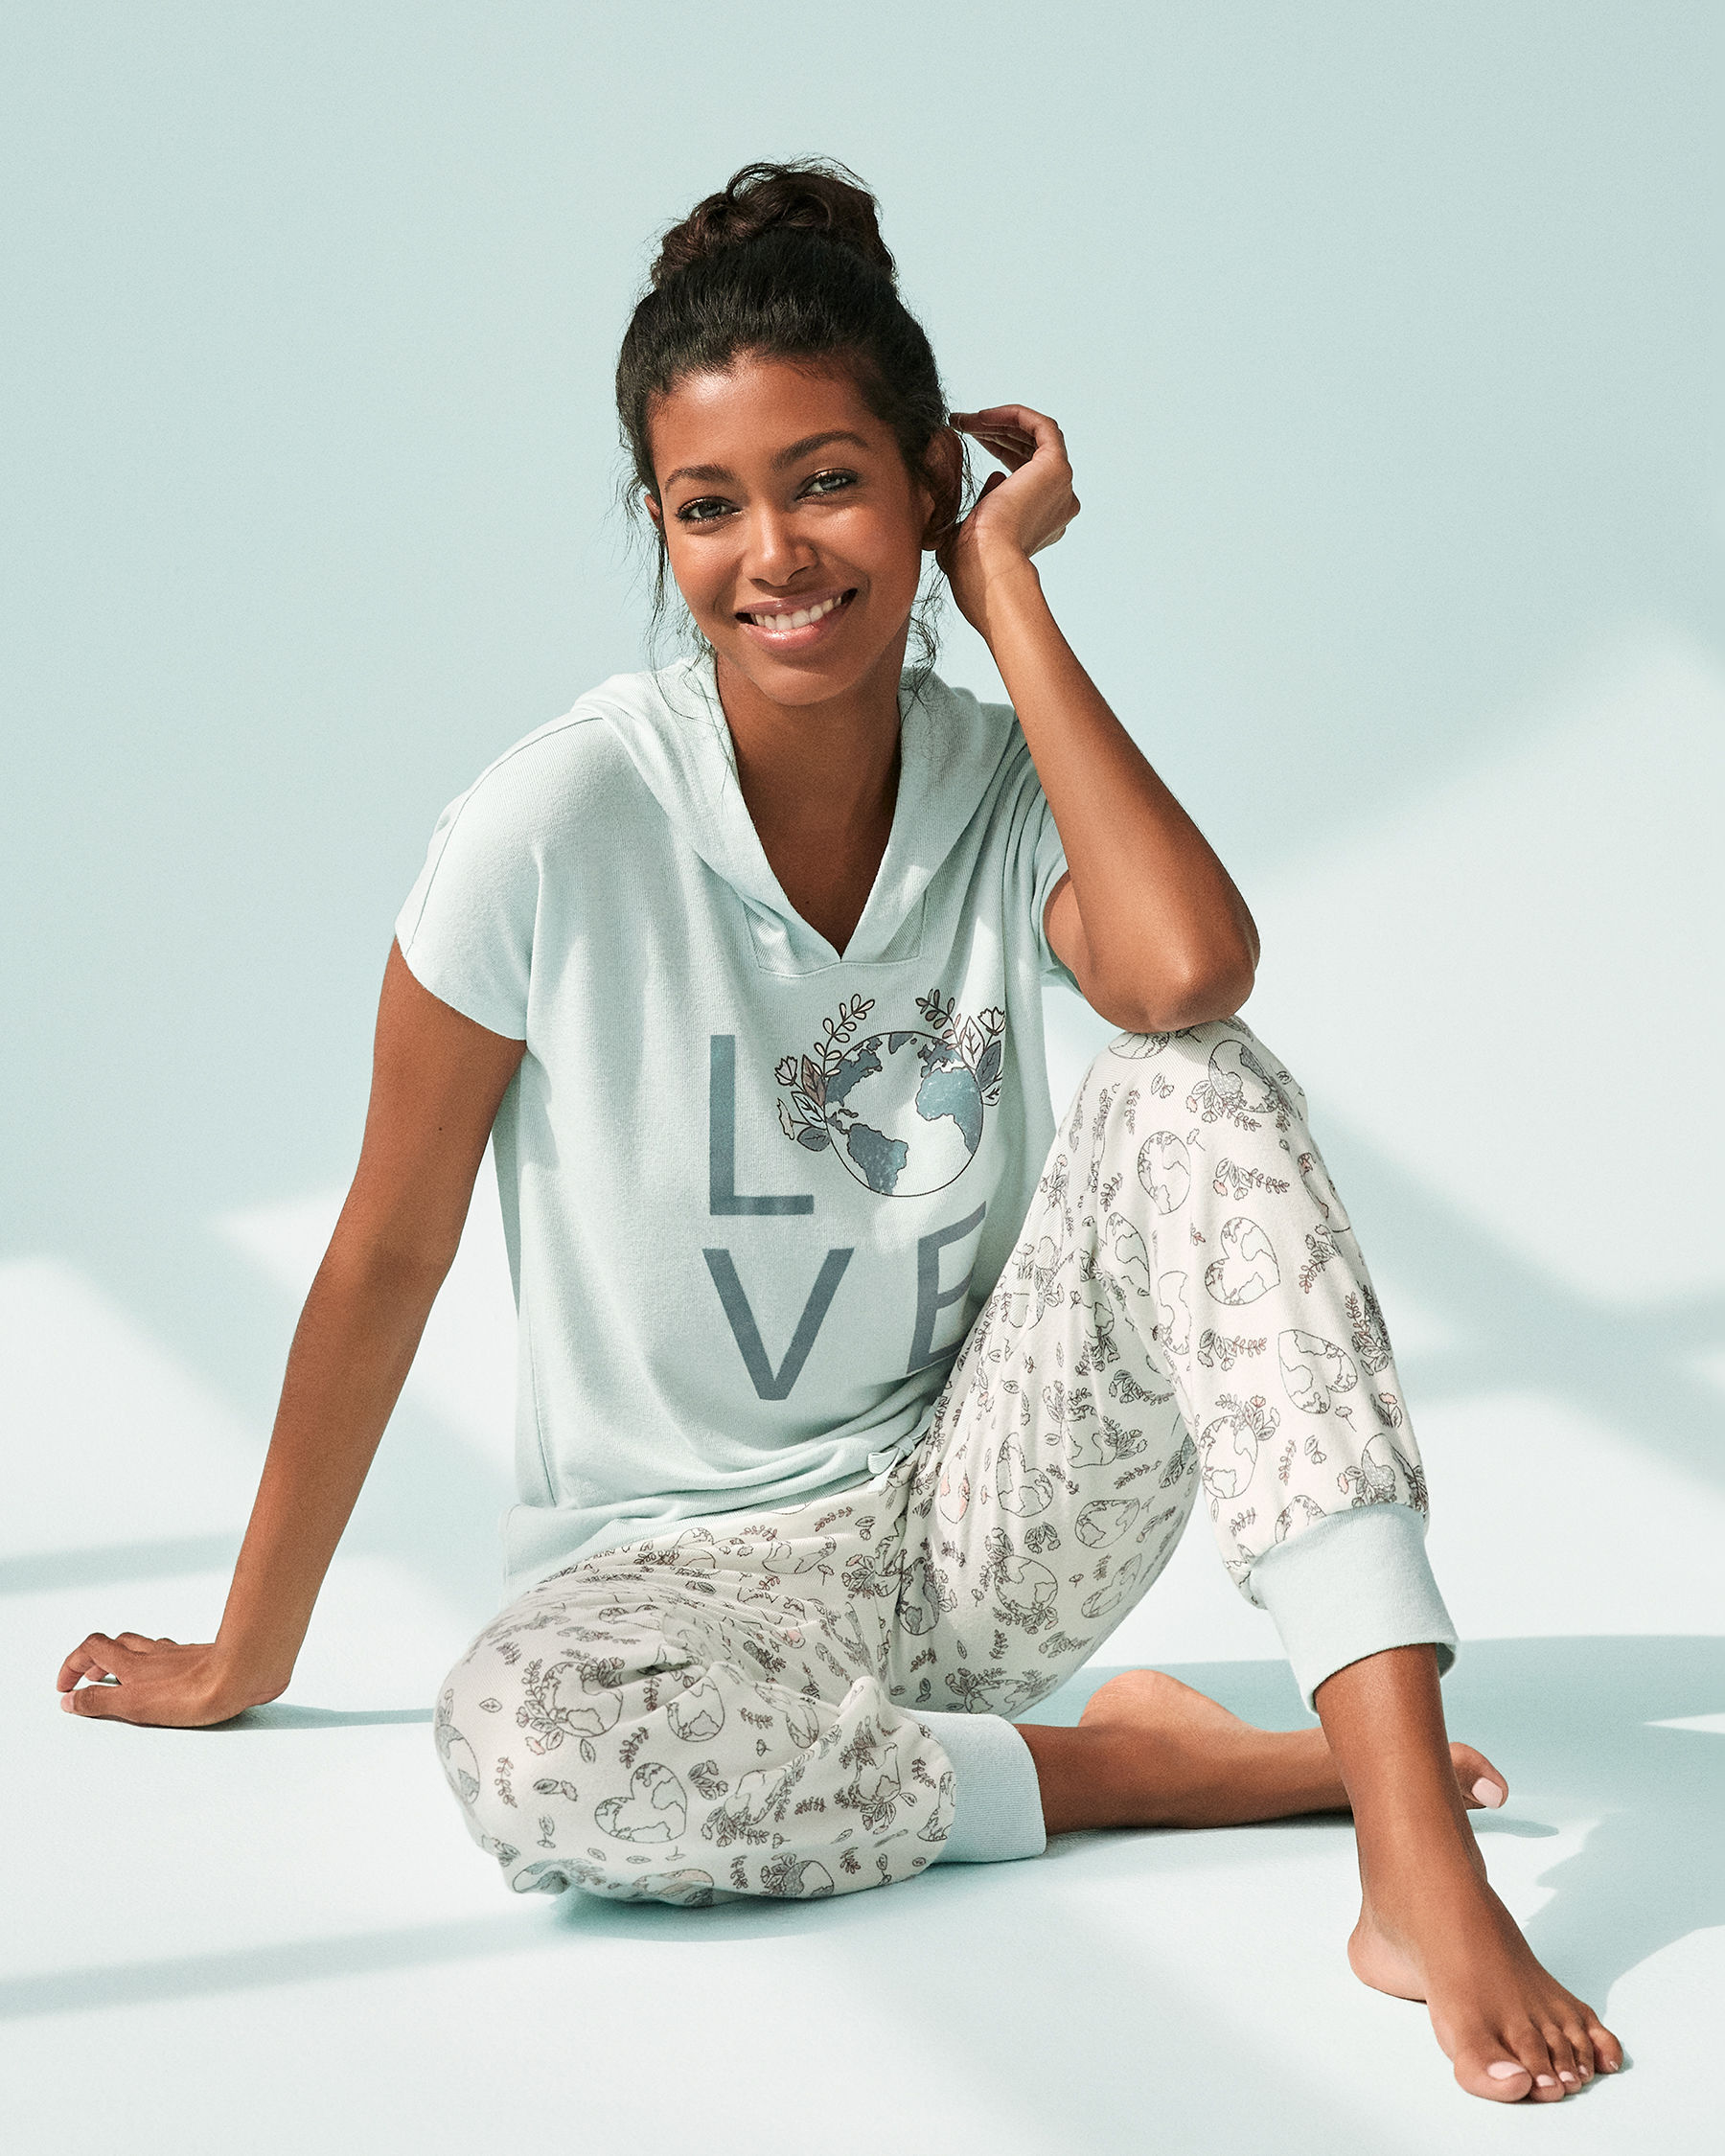 LA VIE EN ROSE Recycled Fibers Hooded T-shirt Blue mix 40100039 - View1